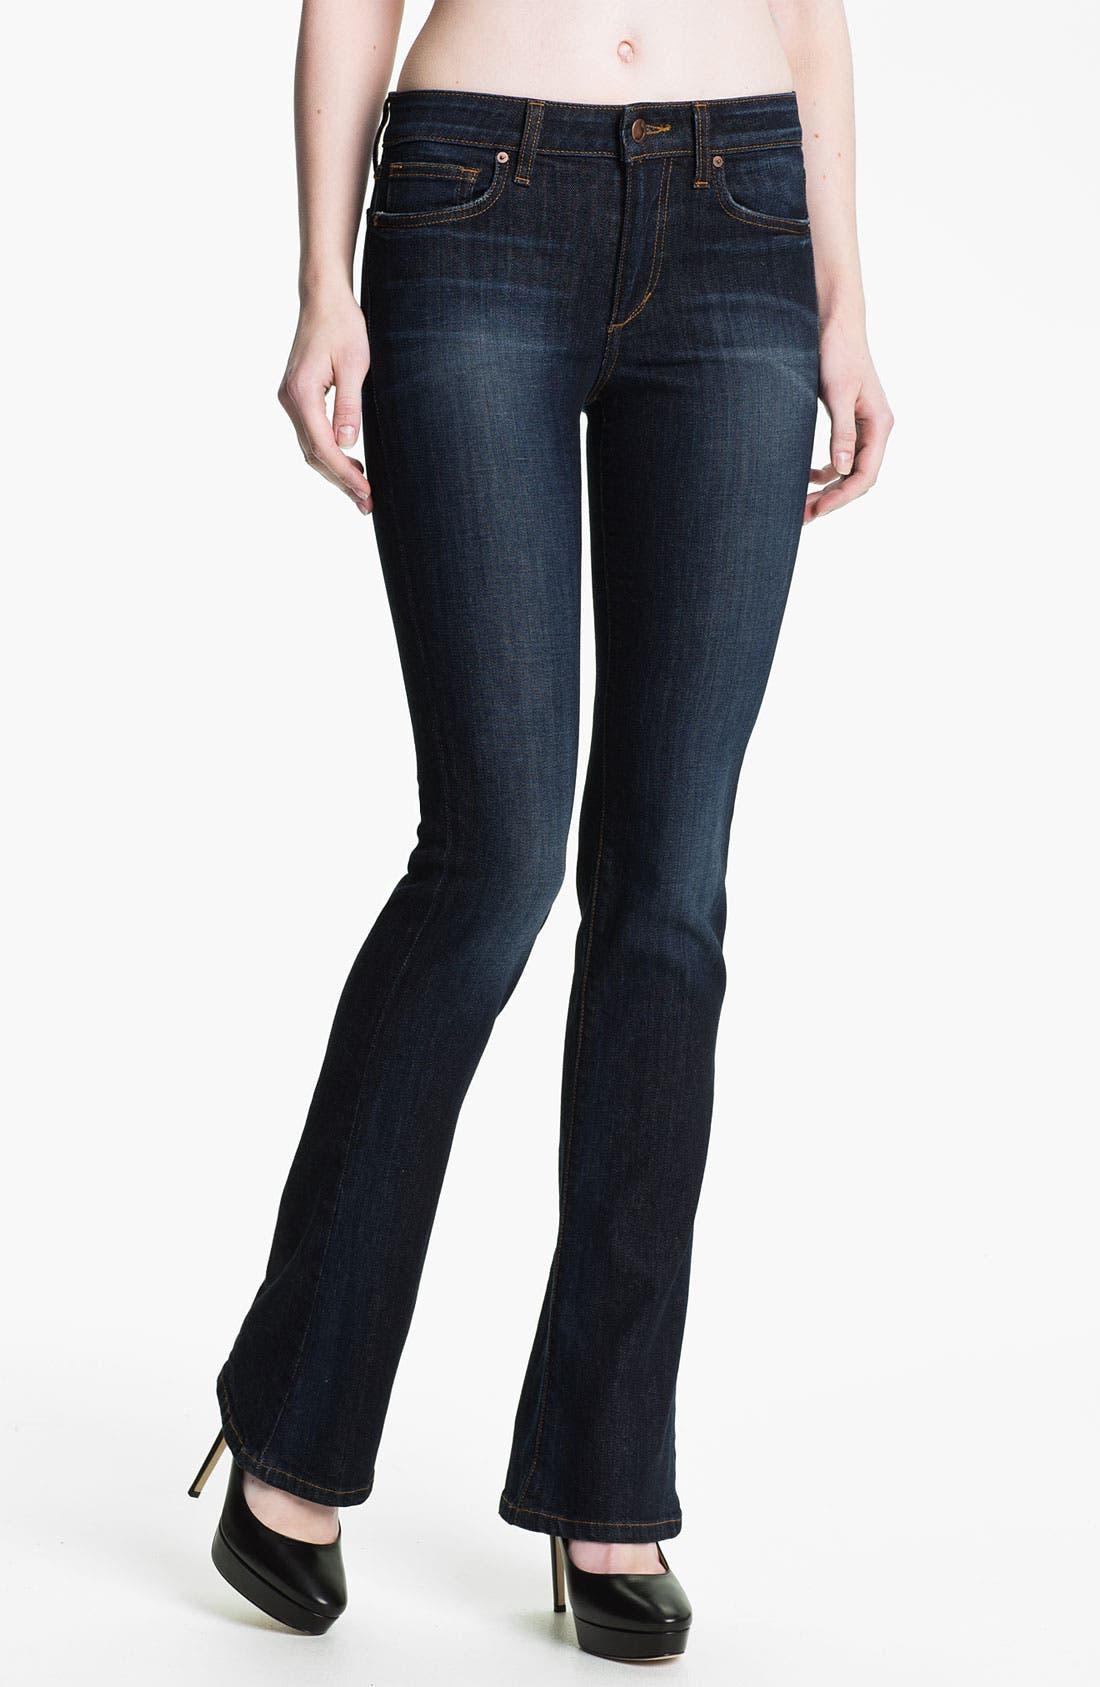 Alternate Image 1 Selected - Joe's Bootcut Stretch Denim Jeans (Bridgette)